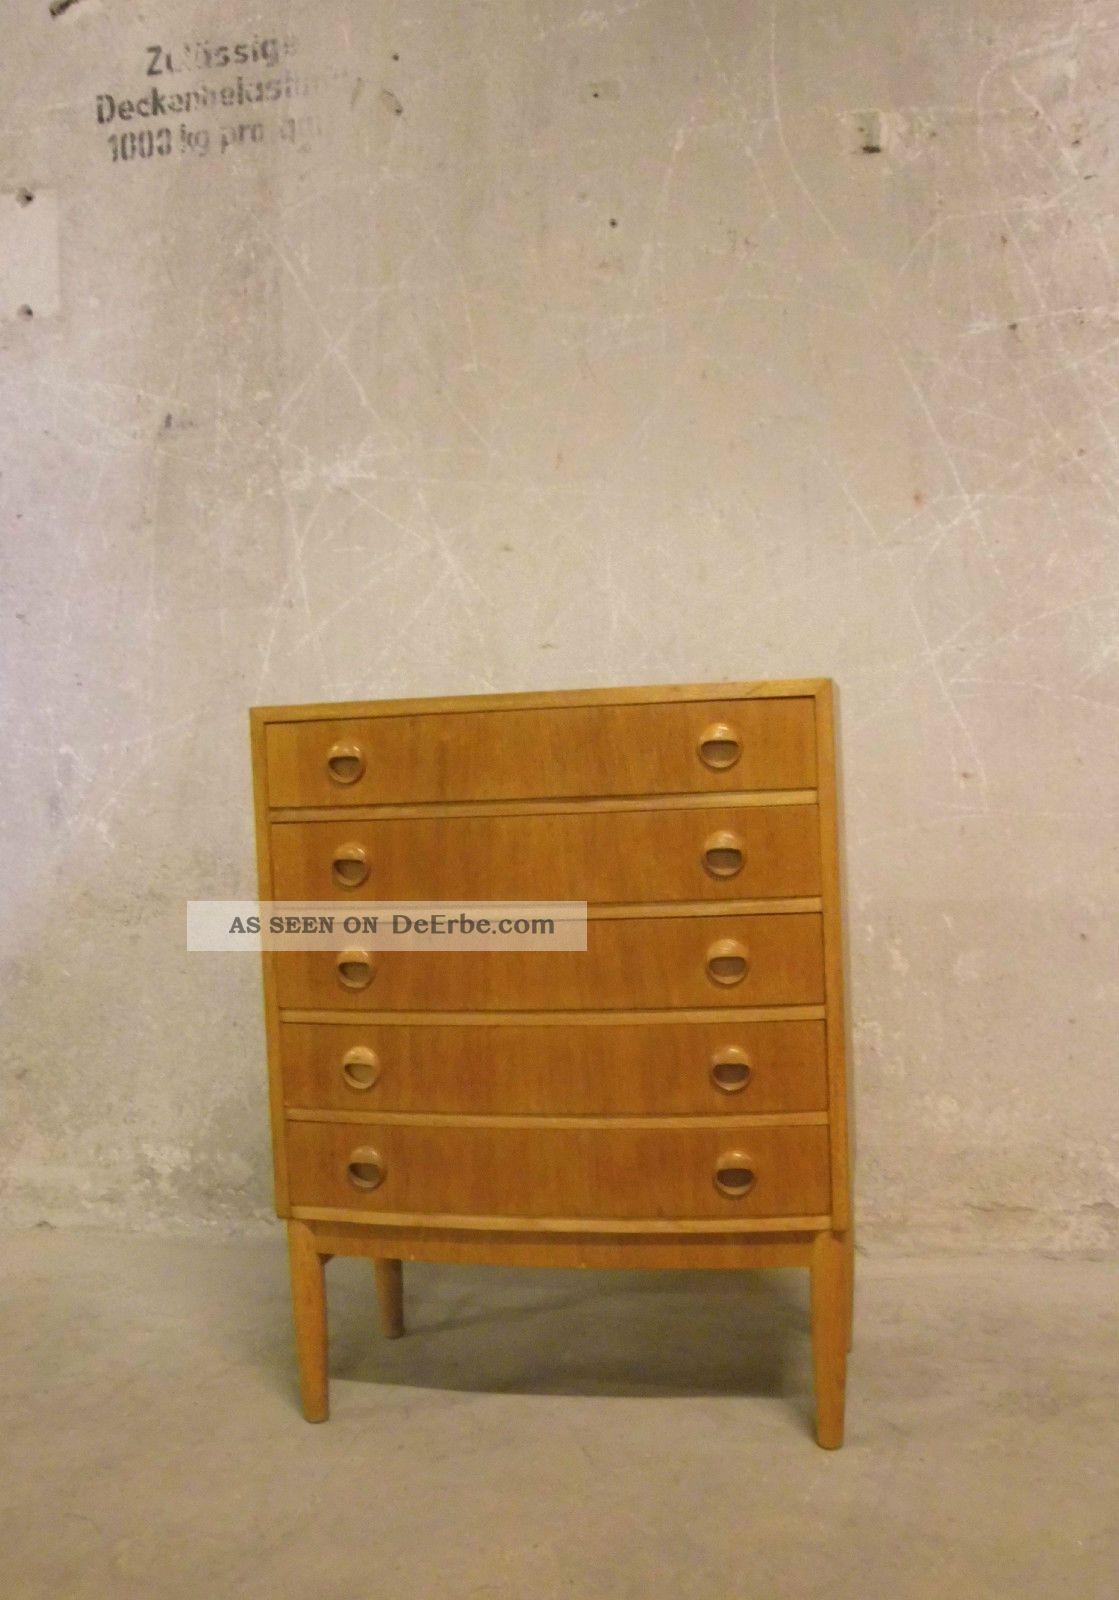 esche kommode danish design denmark mid century modern 50s. Black Bedroom Furniture Sets. Home Design Ideas